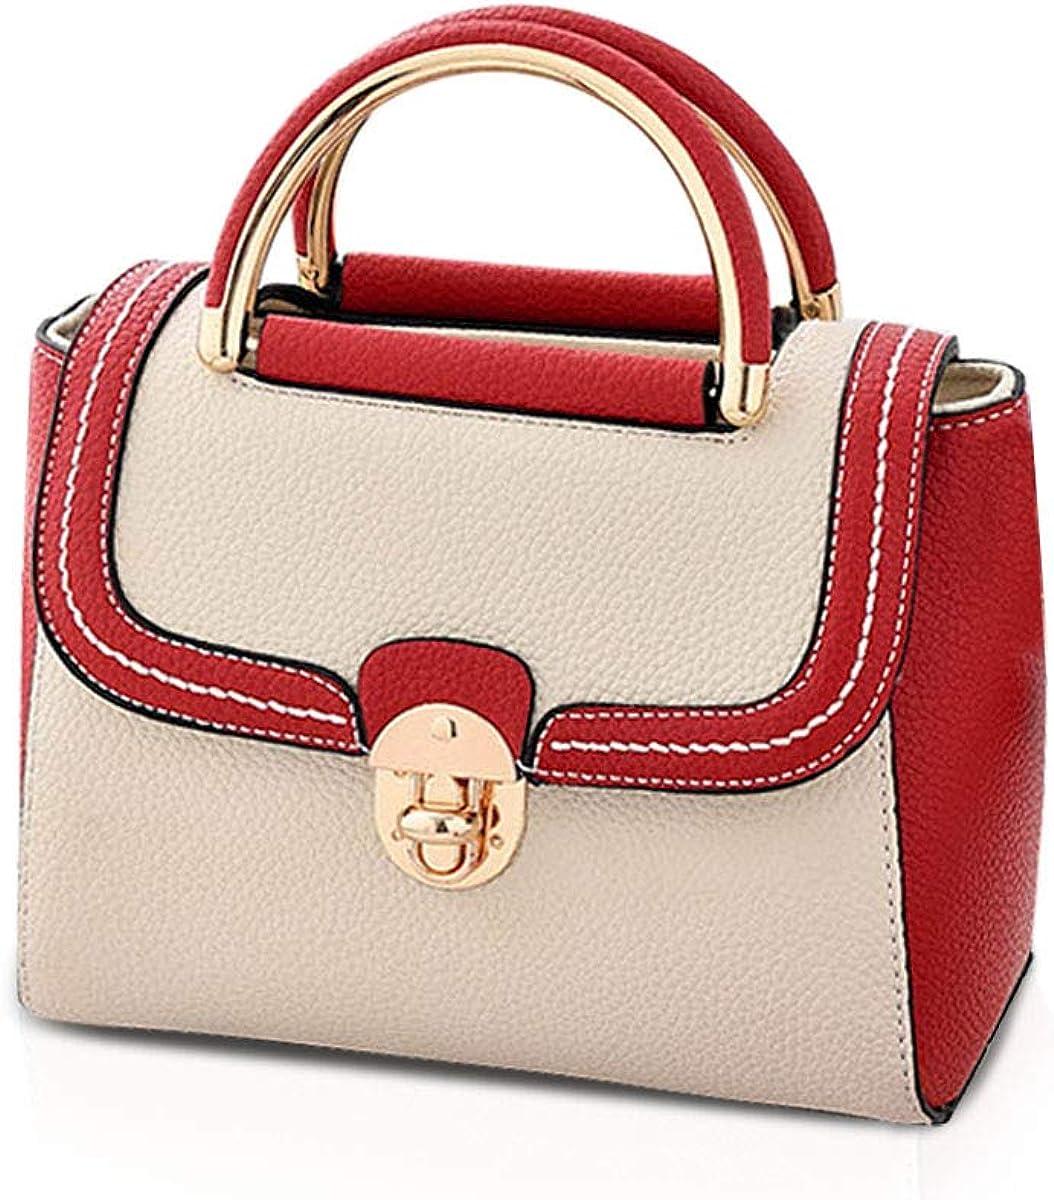 NICOLEDORIS Women Handbag Fashion Cross Lady T Oakland Mall Max 75% OFF Leather body Bag